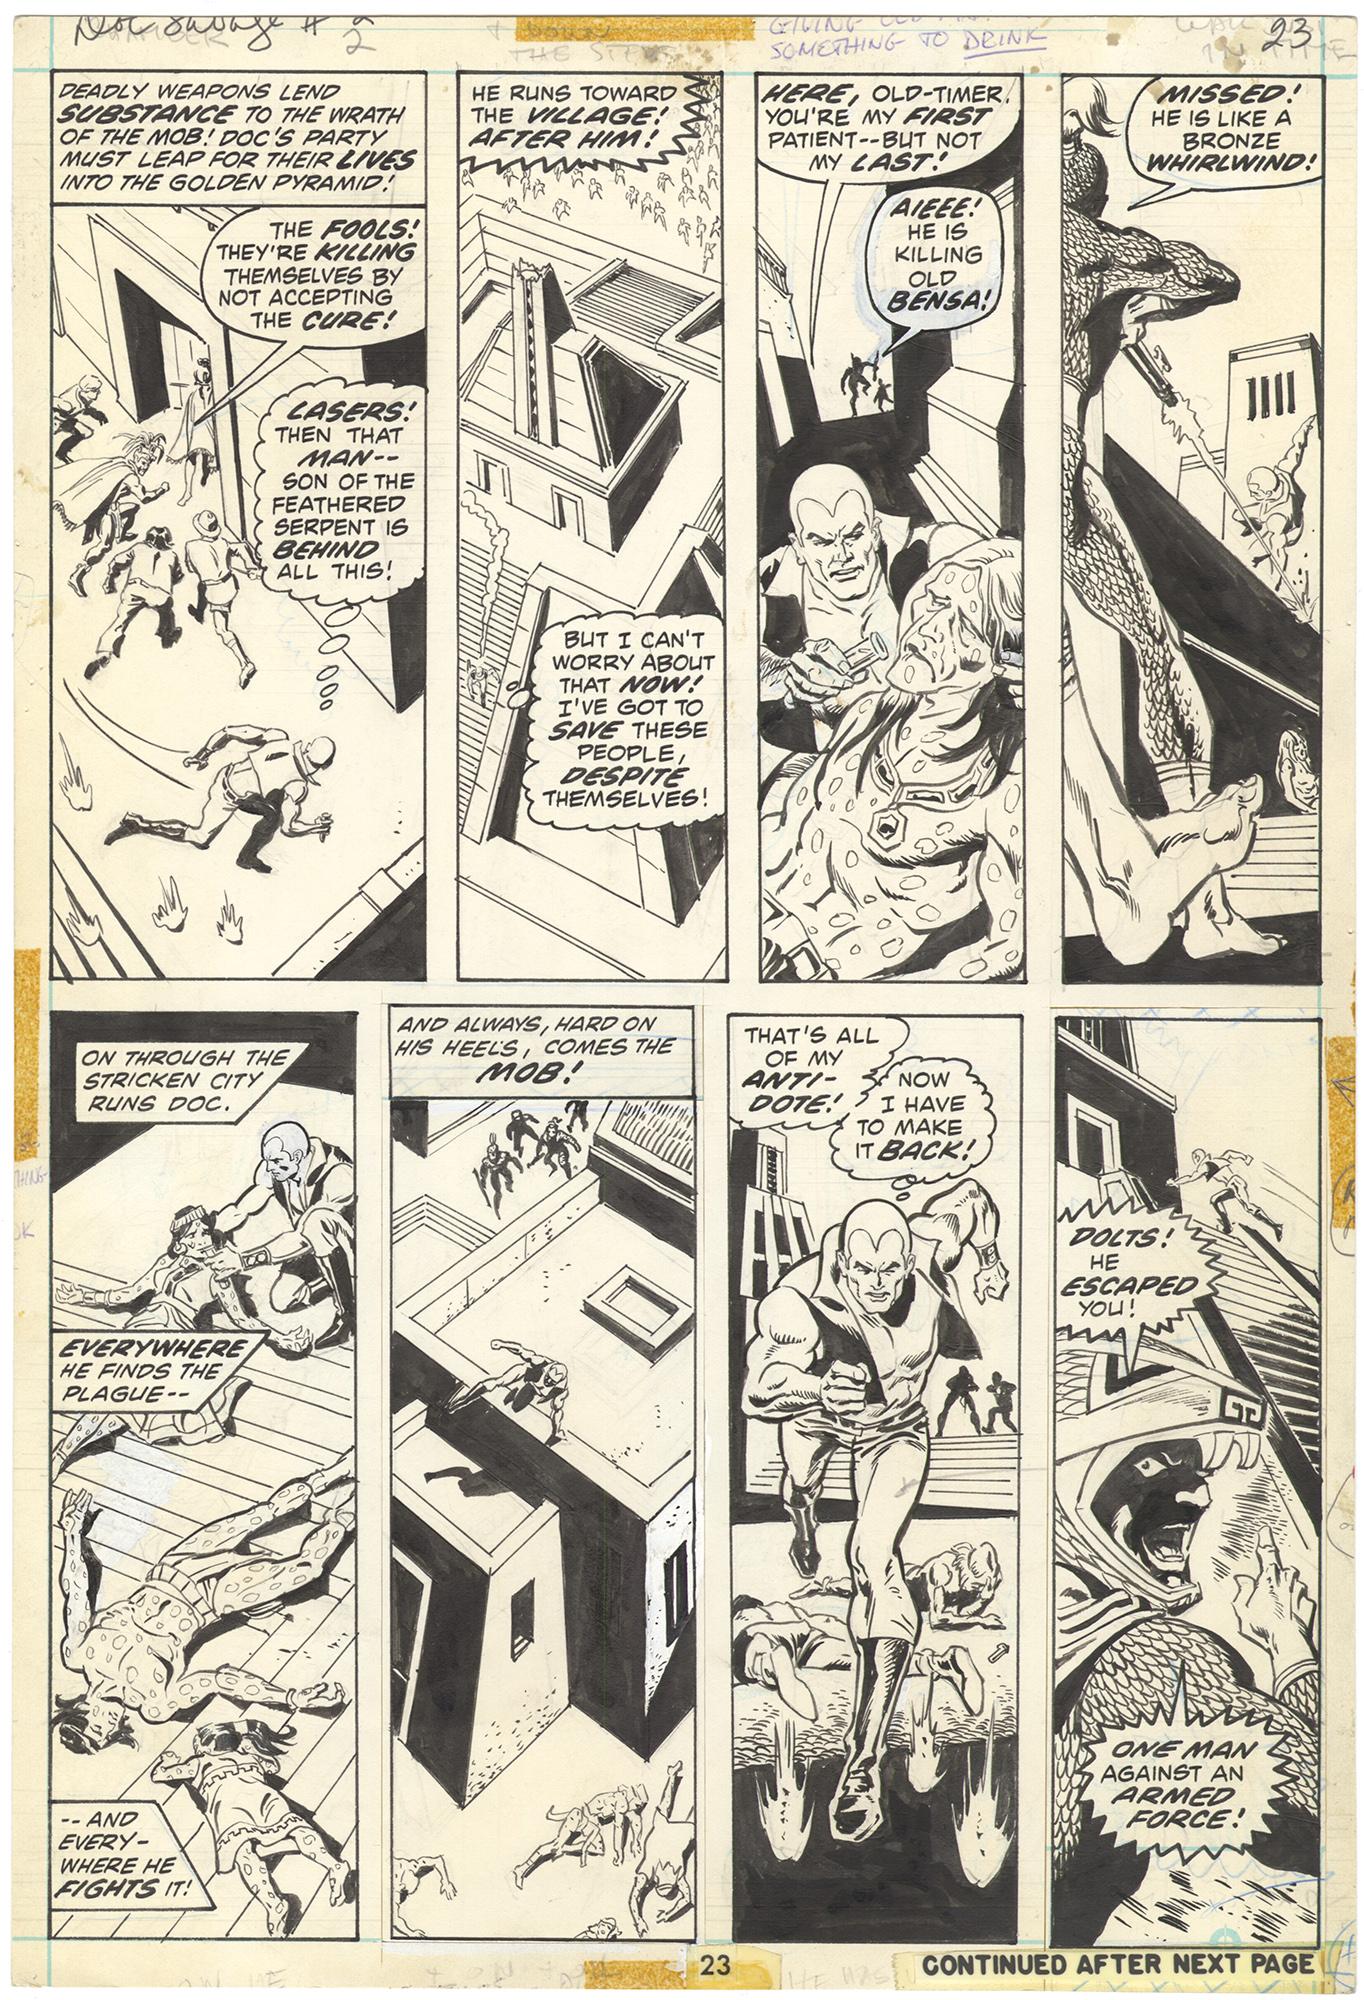 Doc Savage #2 p23